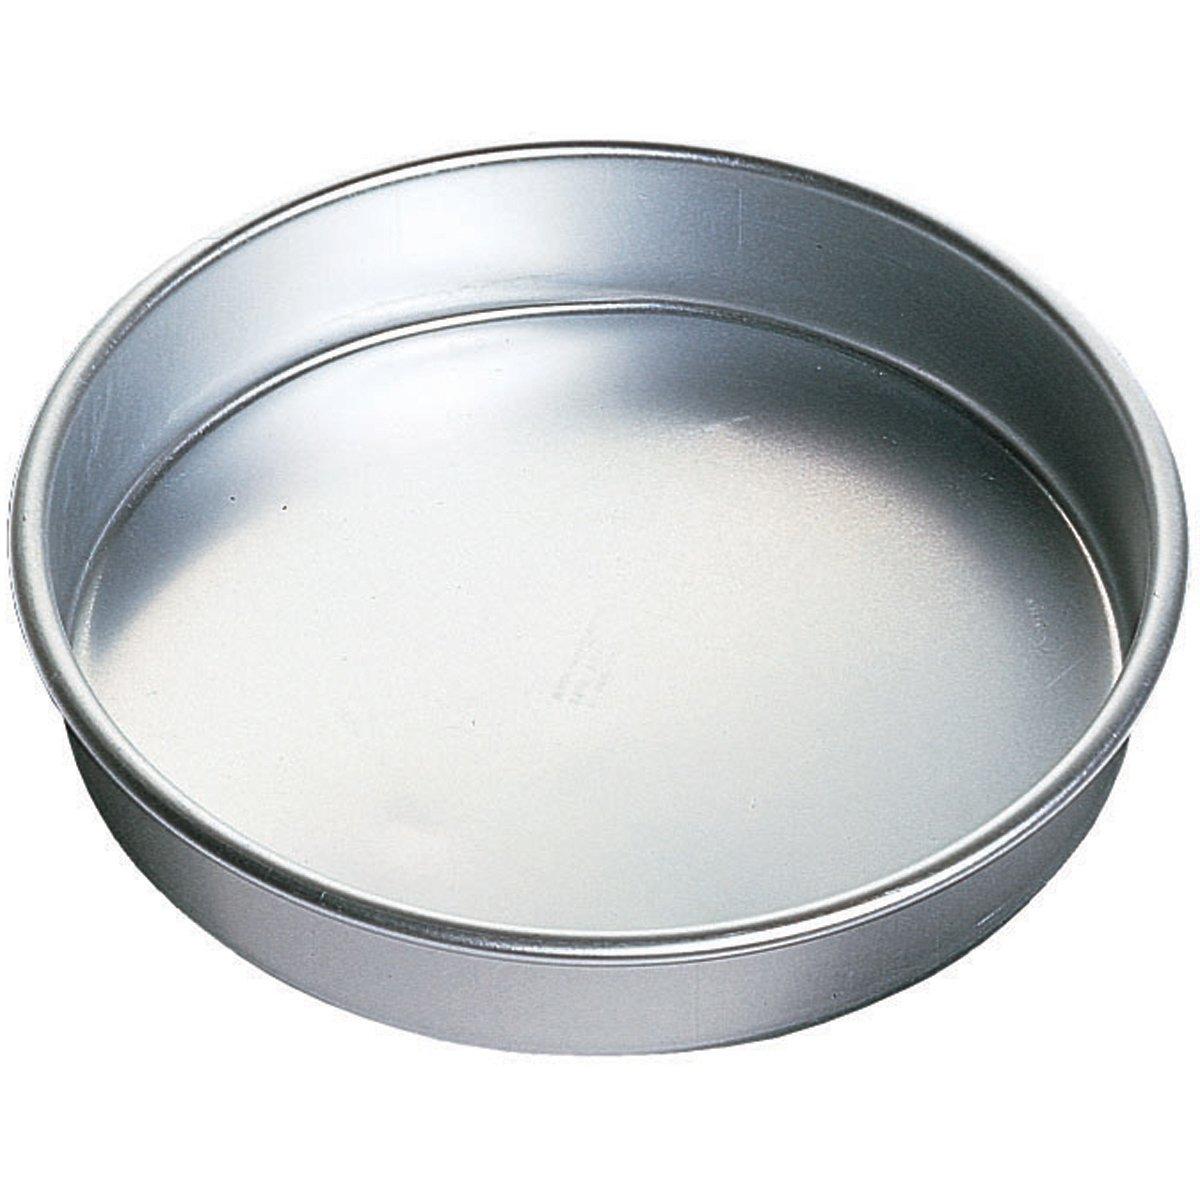 Wilton Aluminum Performance 6 8 10 12 14 16 Inch Round Pans